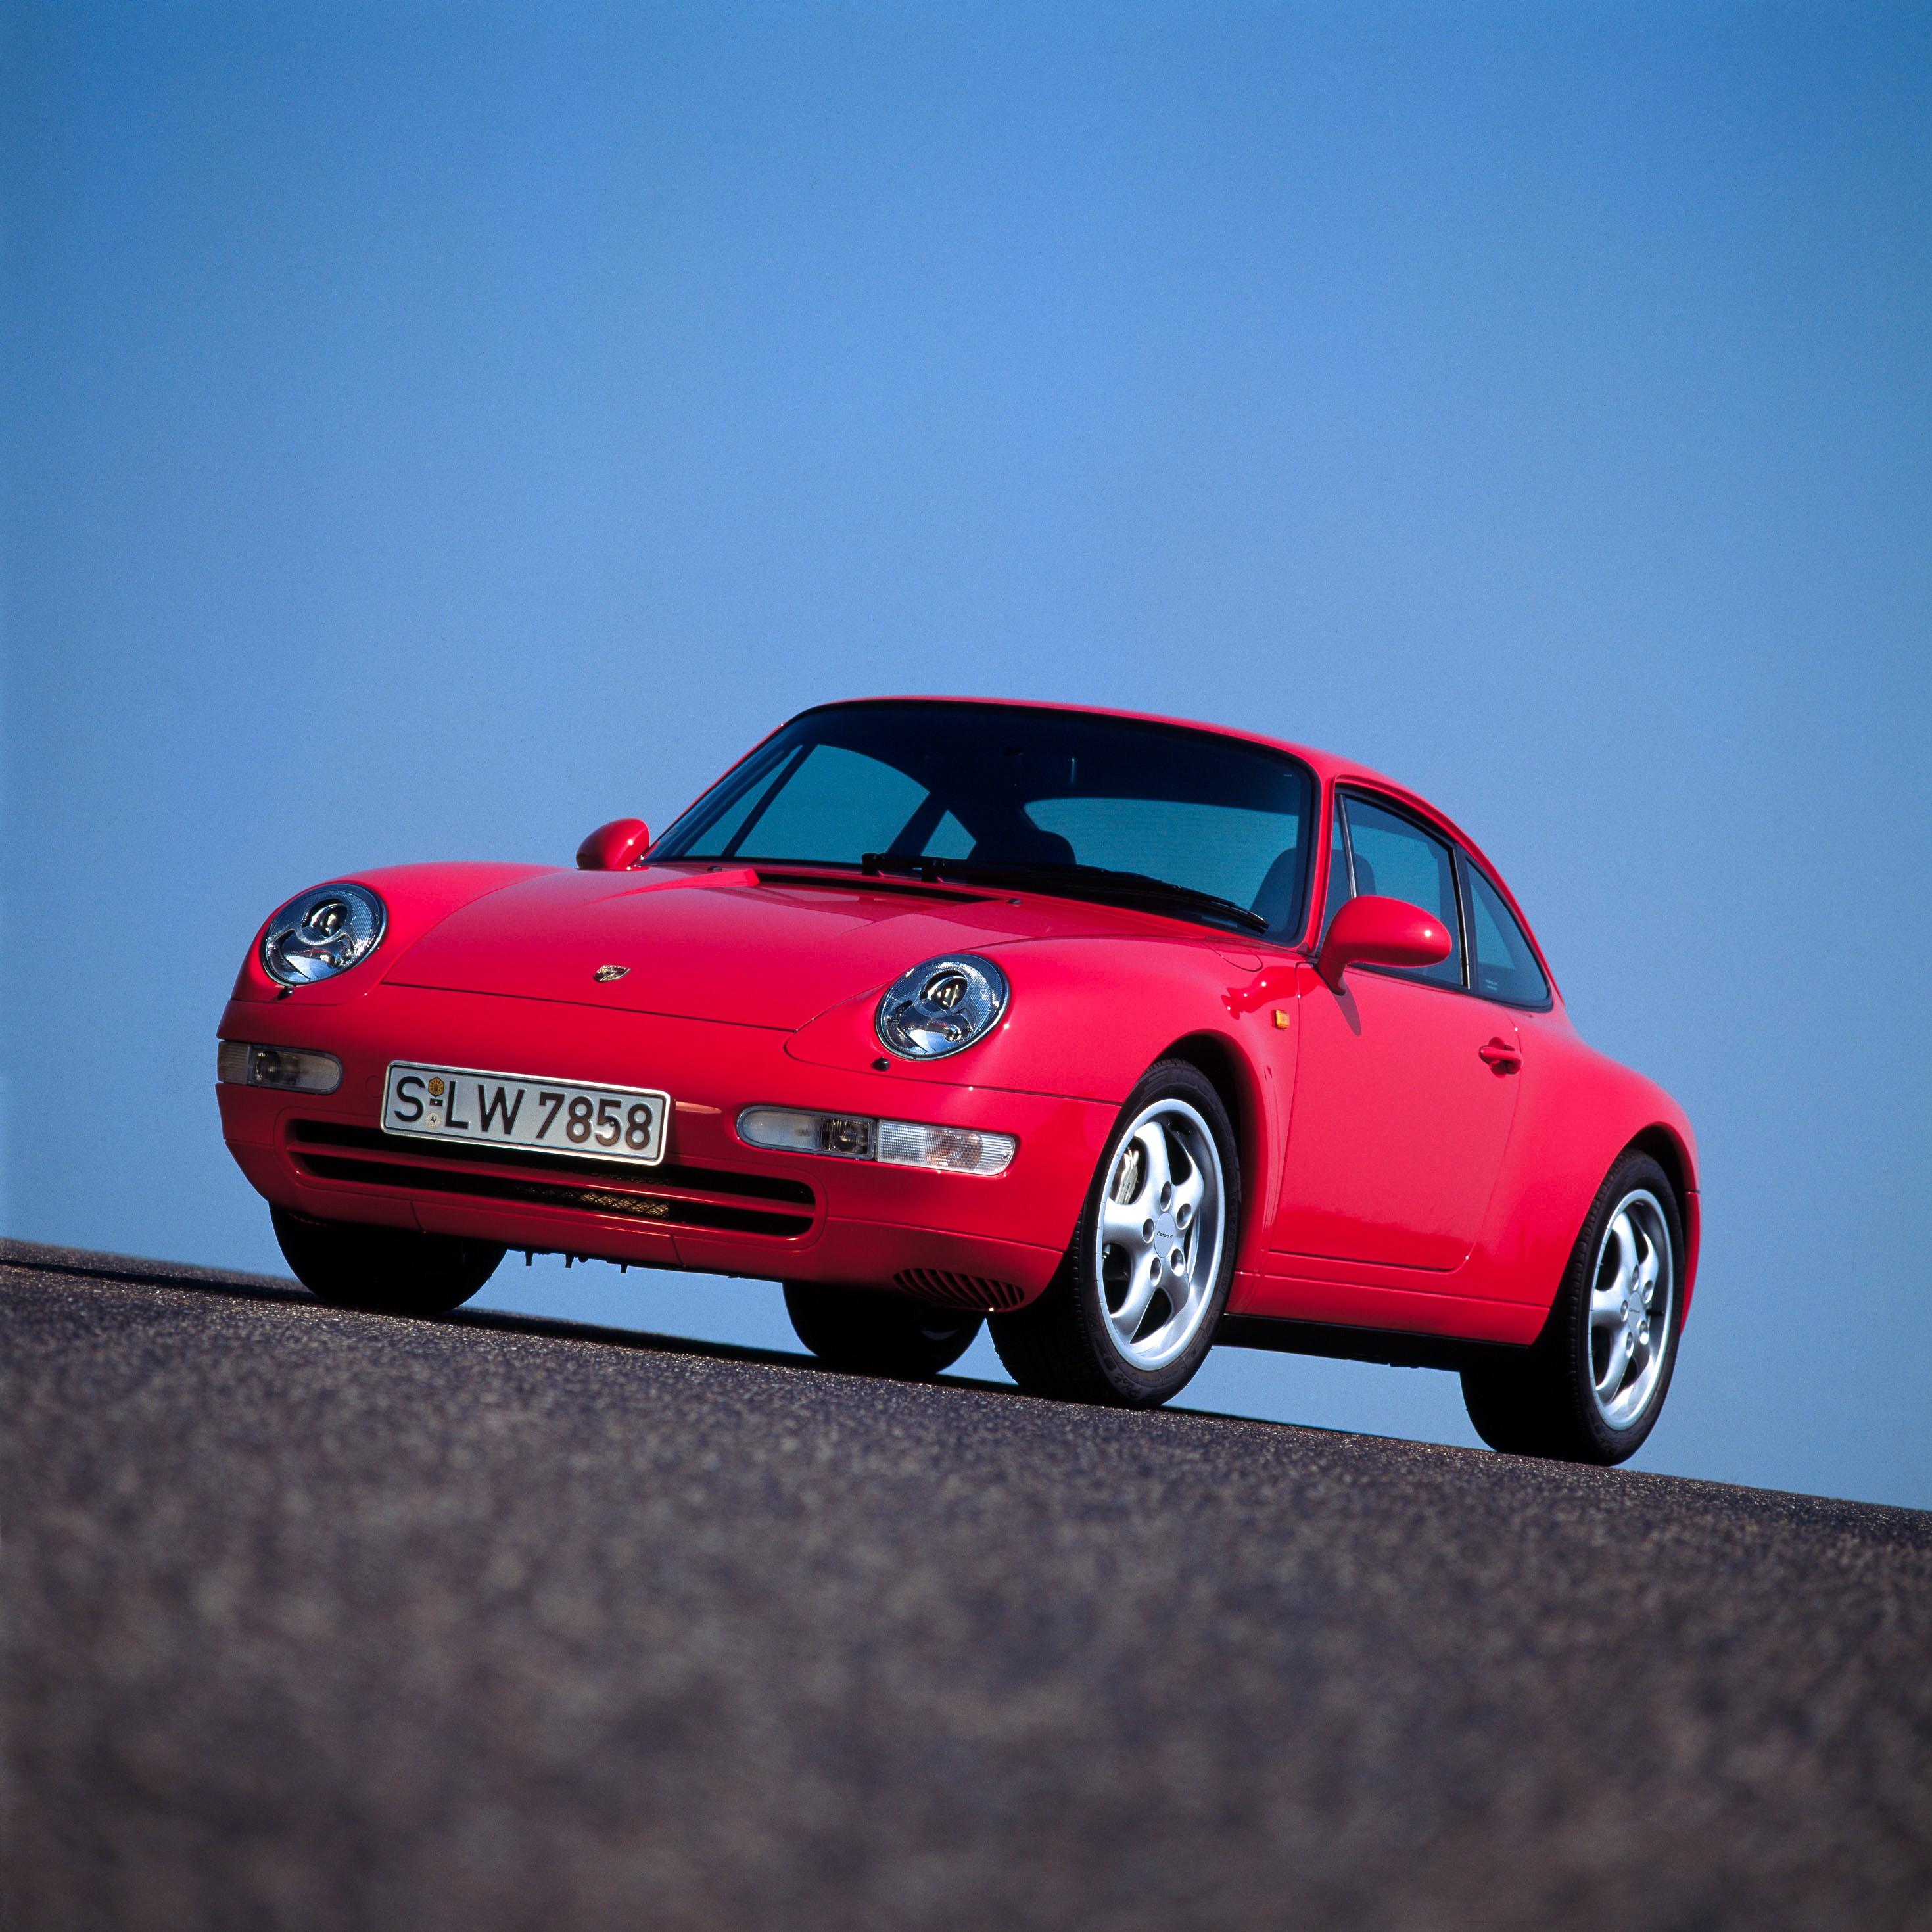 porsche 911 carrera 4 993 specs photos 1994 1995 1996 1997 autoevolution. Black Bedroom Furniture Sets. Home Design Ideas